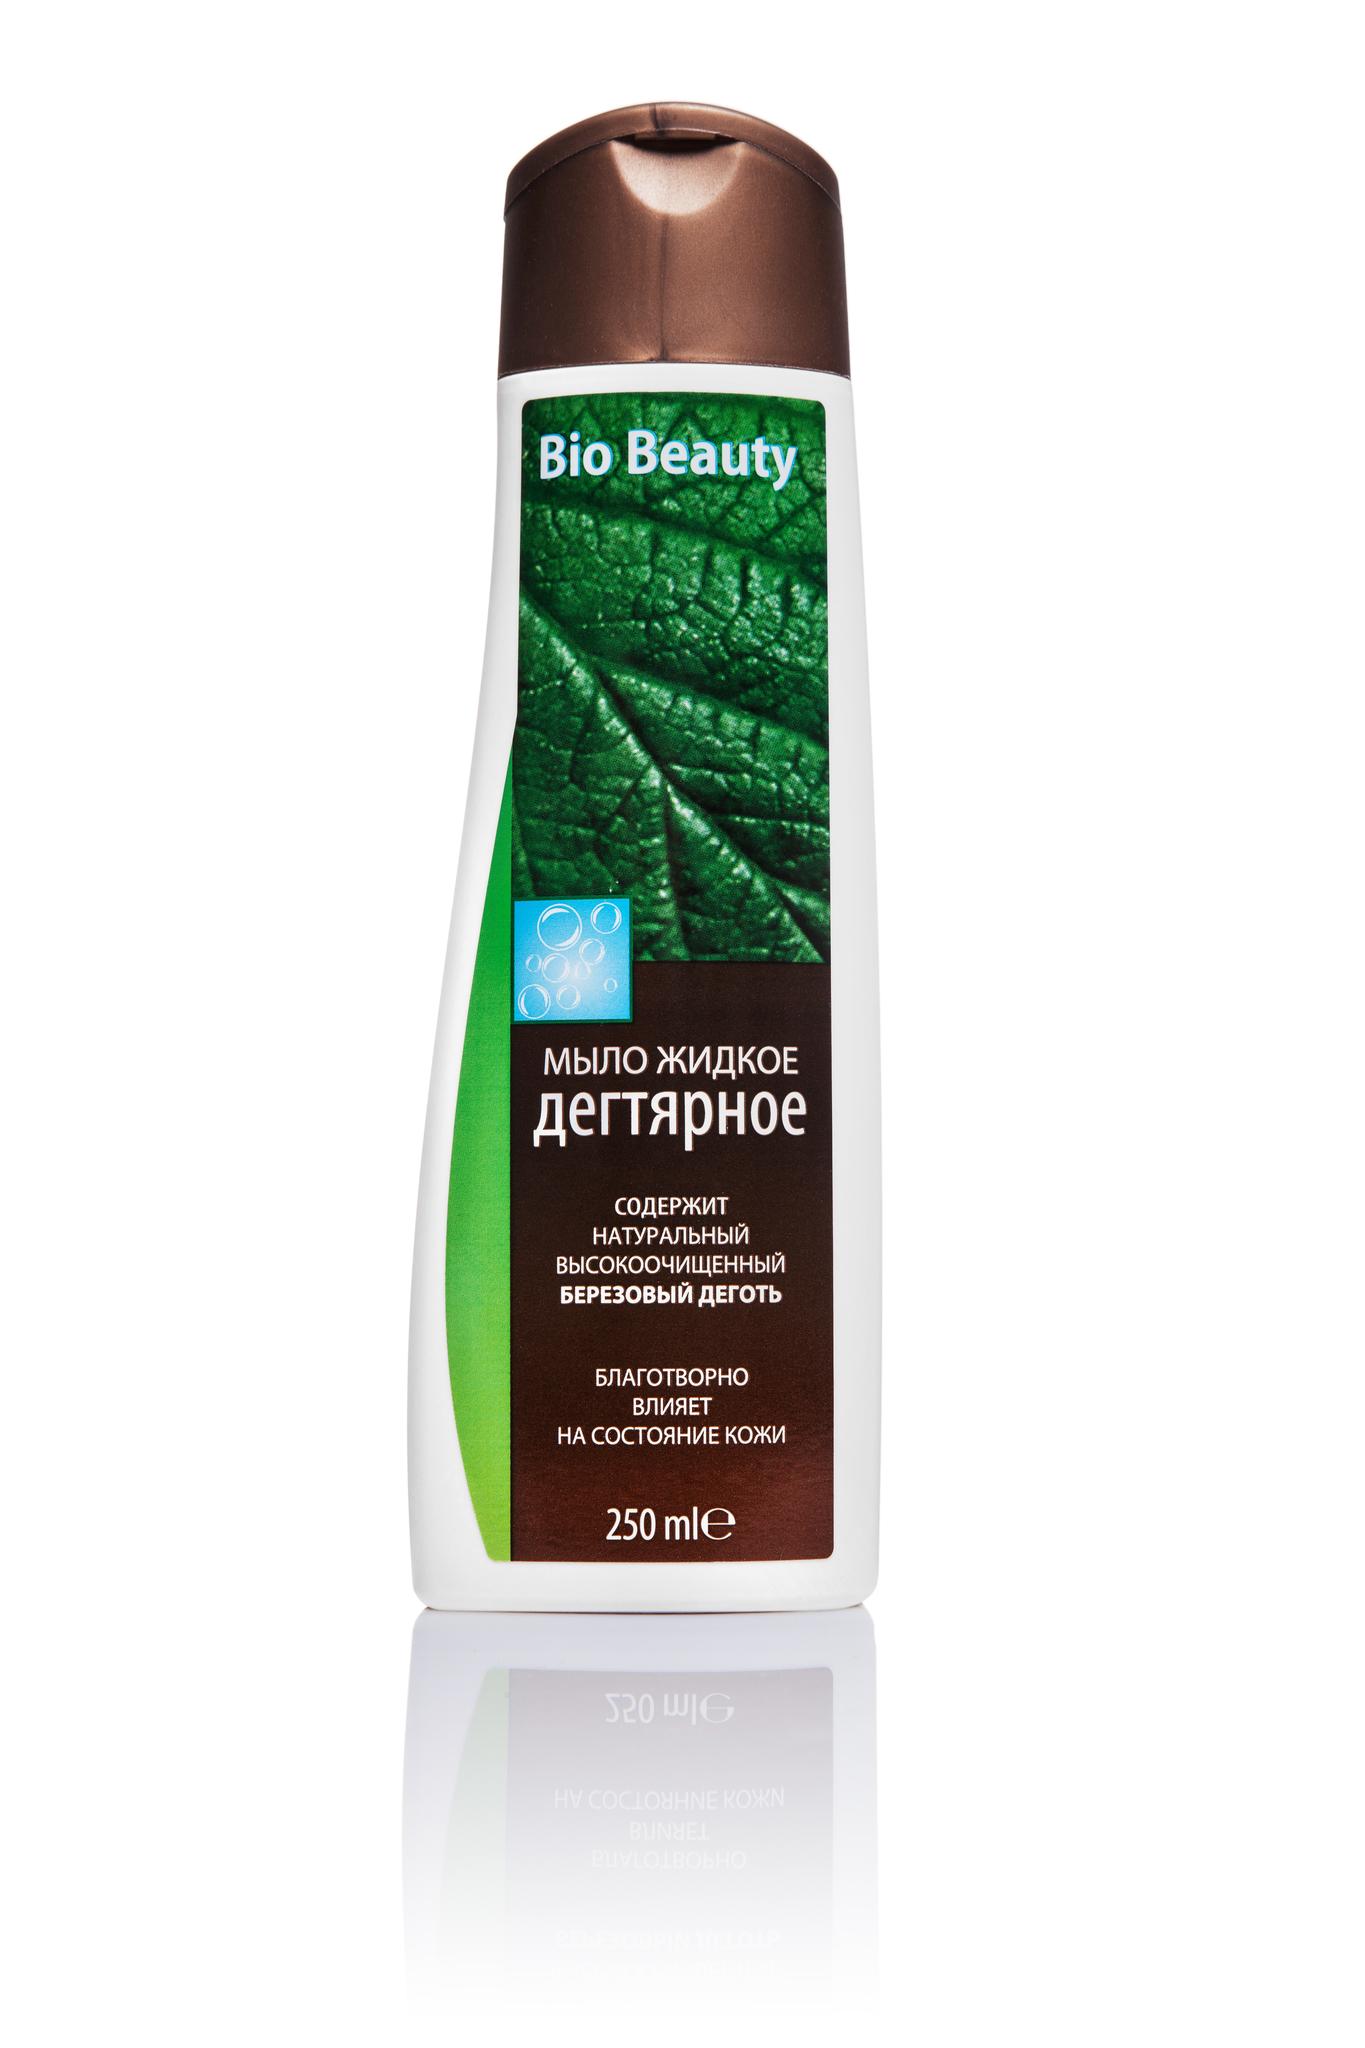 Bio Beauty мыло жидкое дегтярное 250 мл.